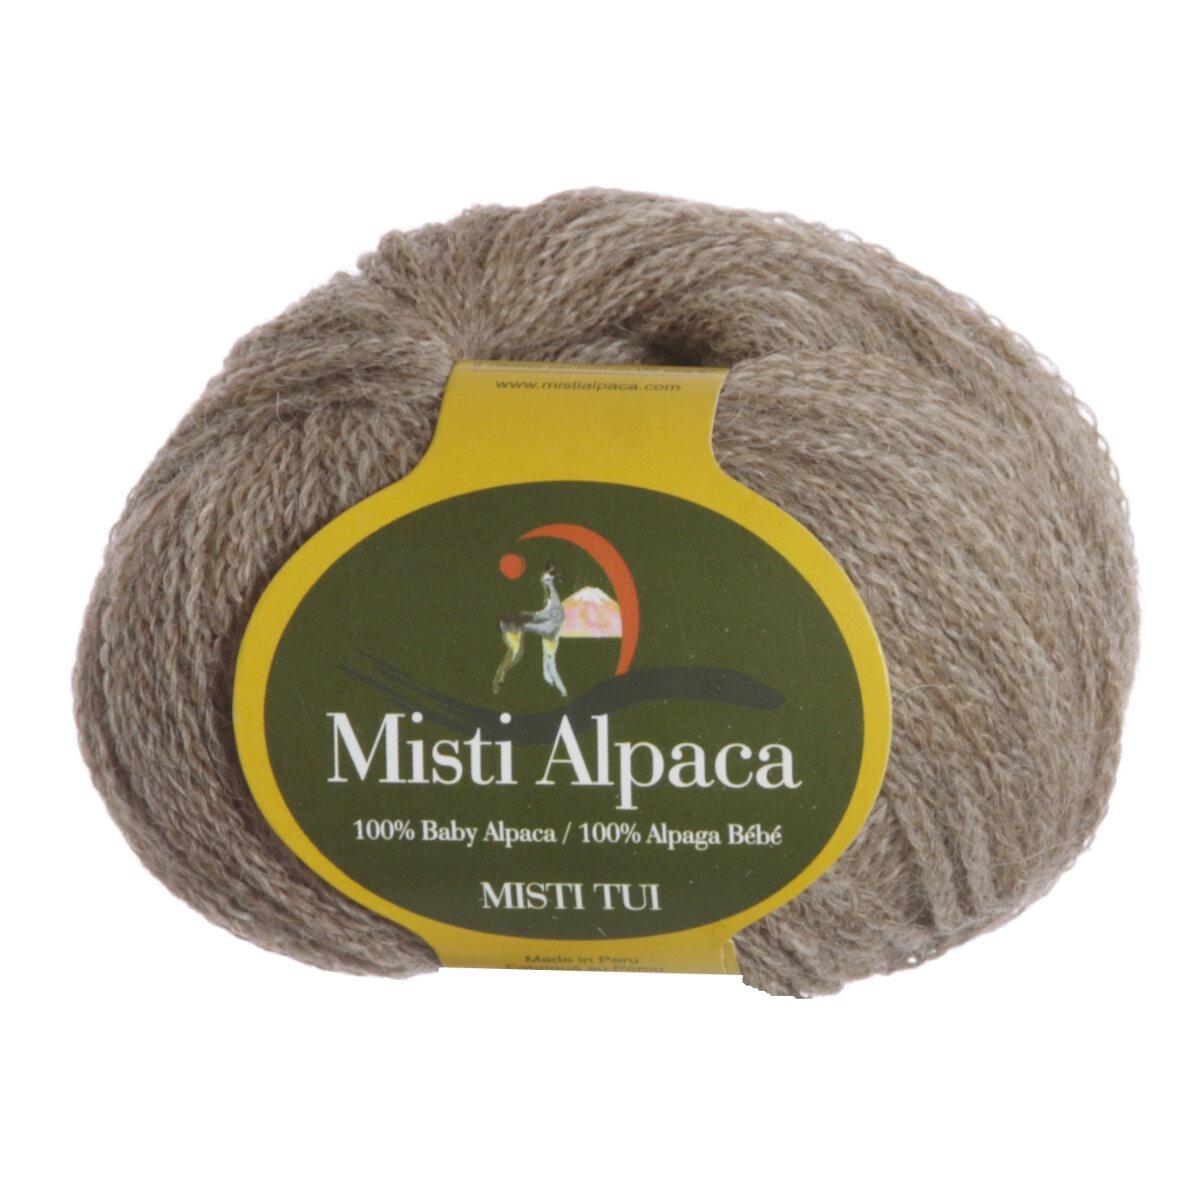 Misti Alpaca Tui Yarn - 284 Taupe at Jimmy Beans Wool